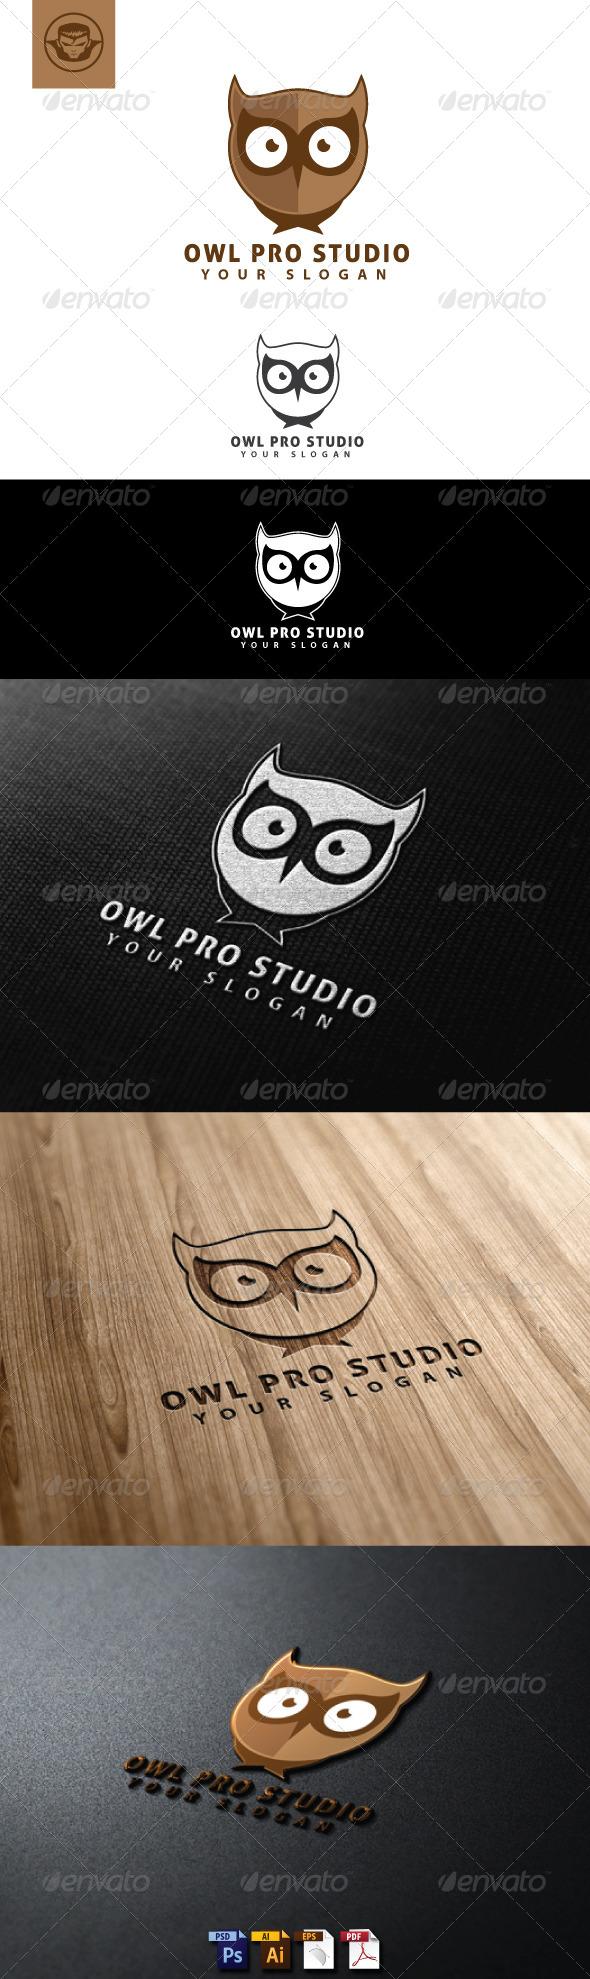 Owl Pro Studio Logo Template - Animals Logo Templates